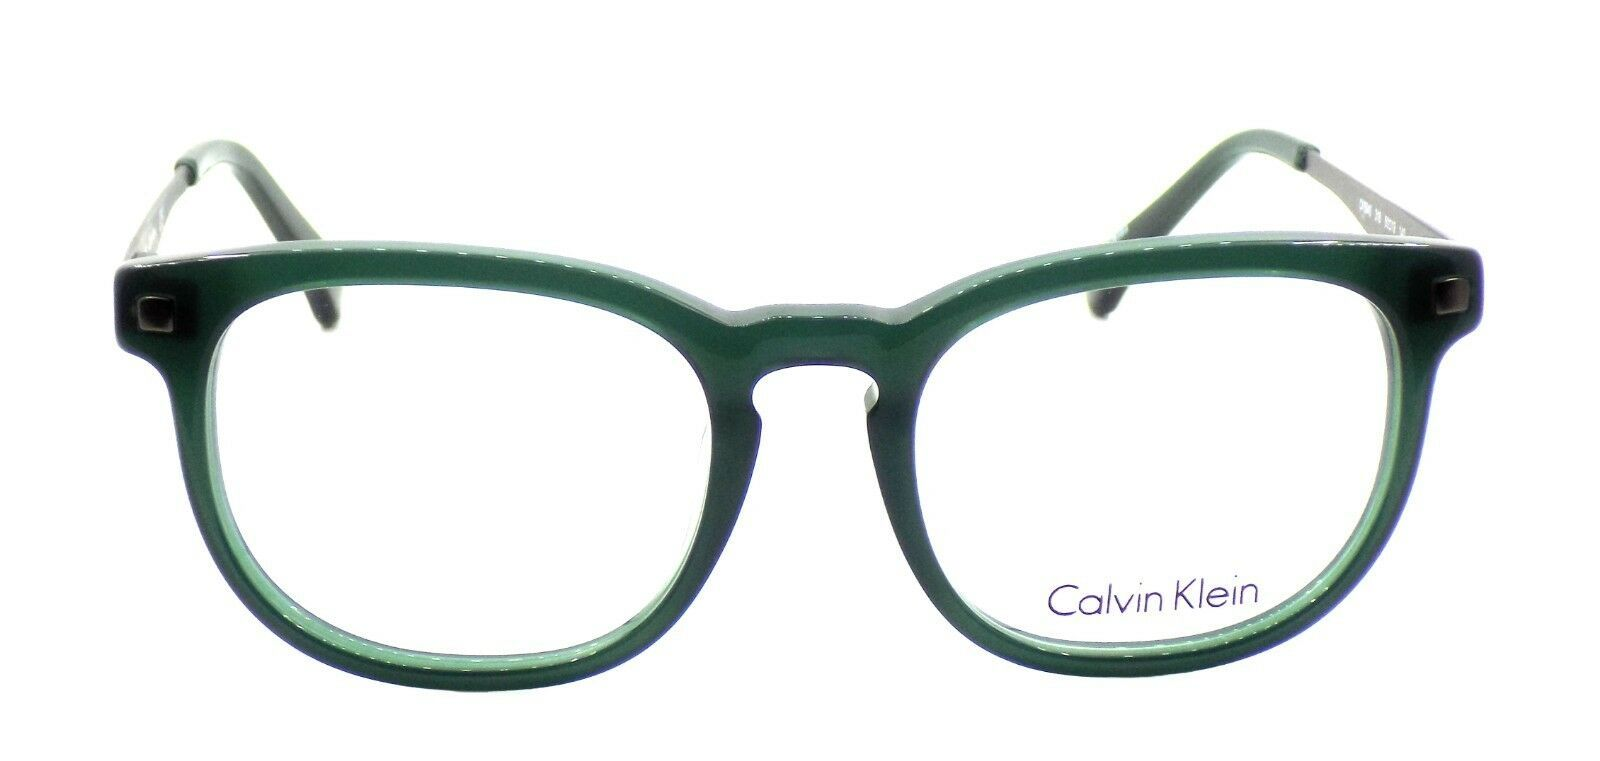 Calvin Klein CK5940 318 Unisex Eyeglasses Frames Olive 50-19-140 + CASE